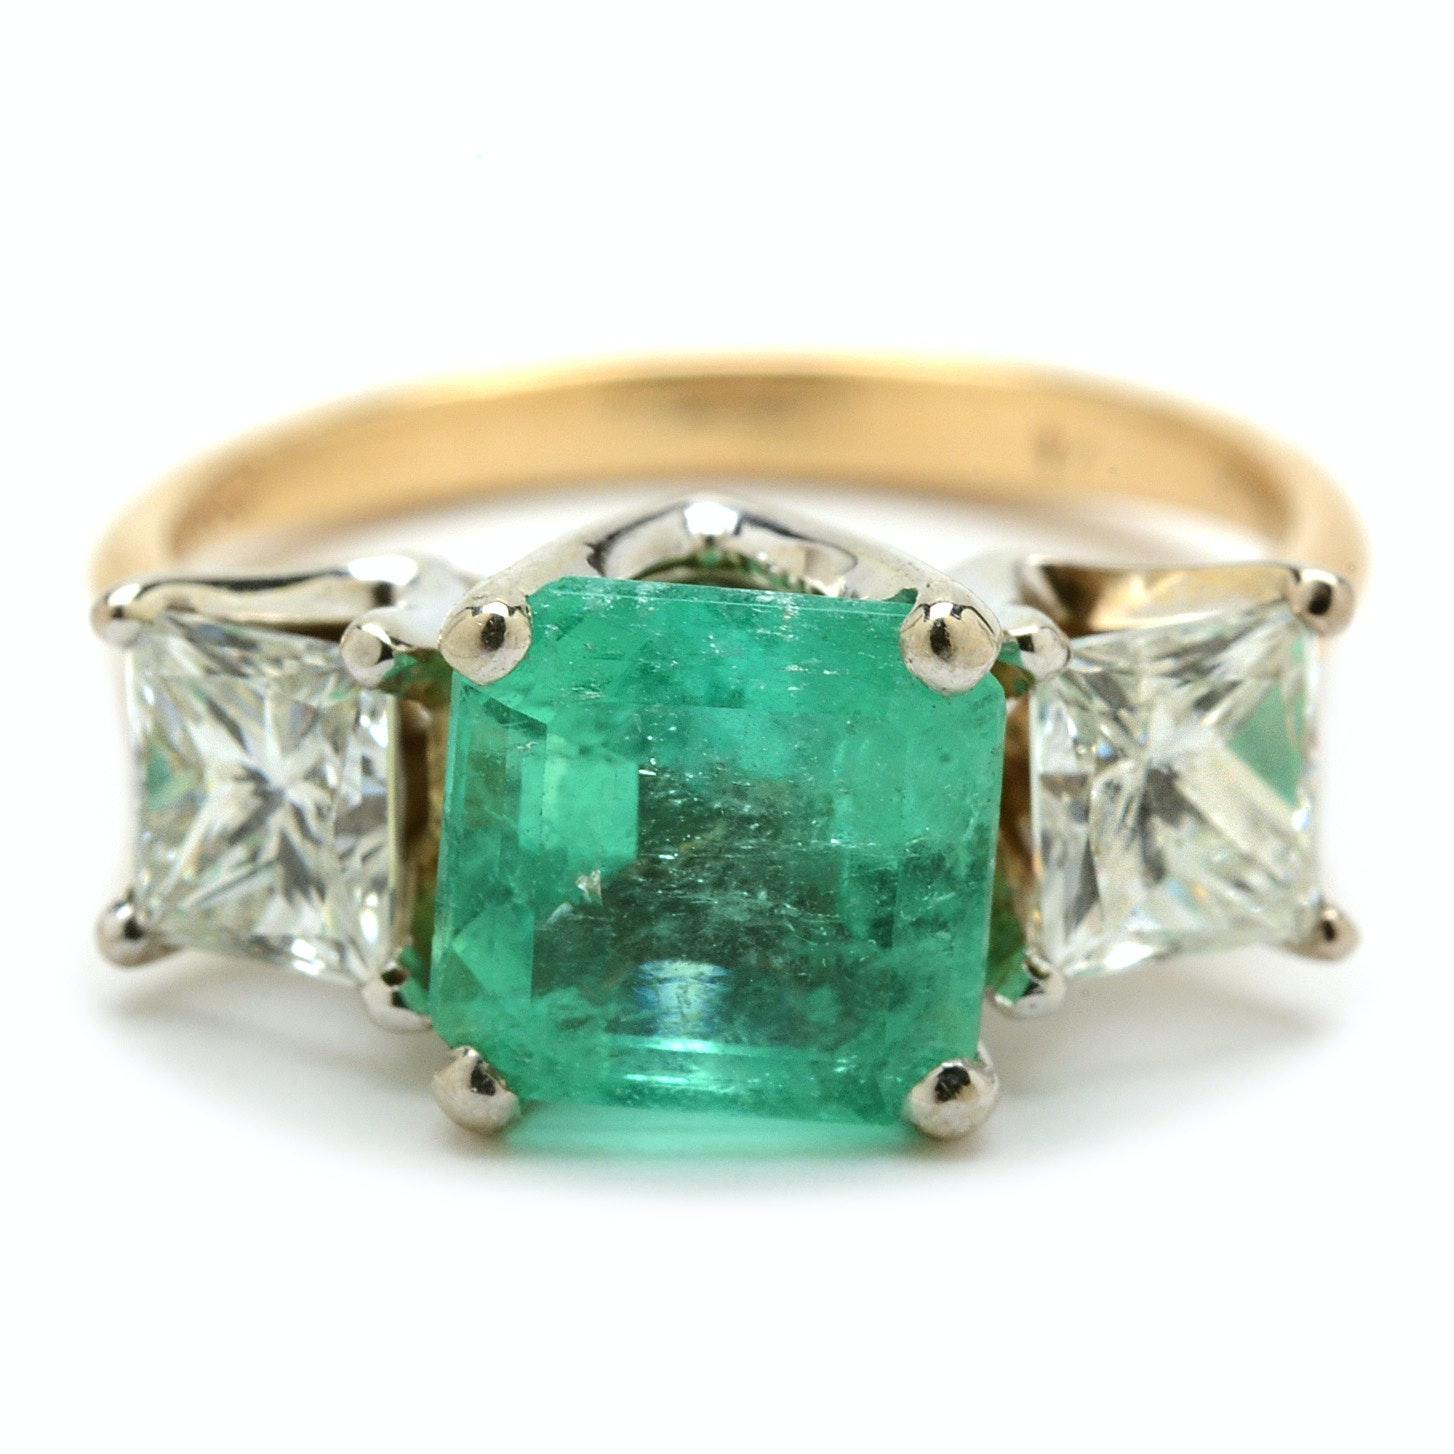 14K Yellow Gold 1.68 Carat Natural Emerald and 1.02 CTW Diamond Ring